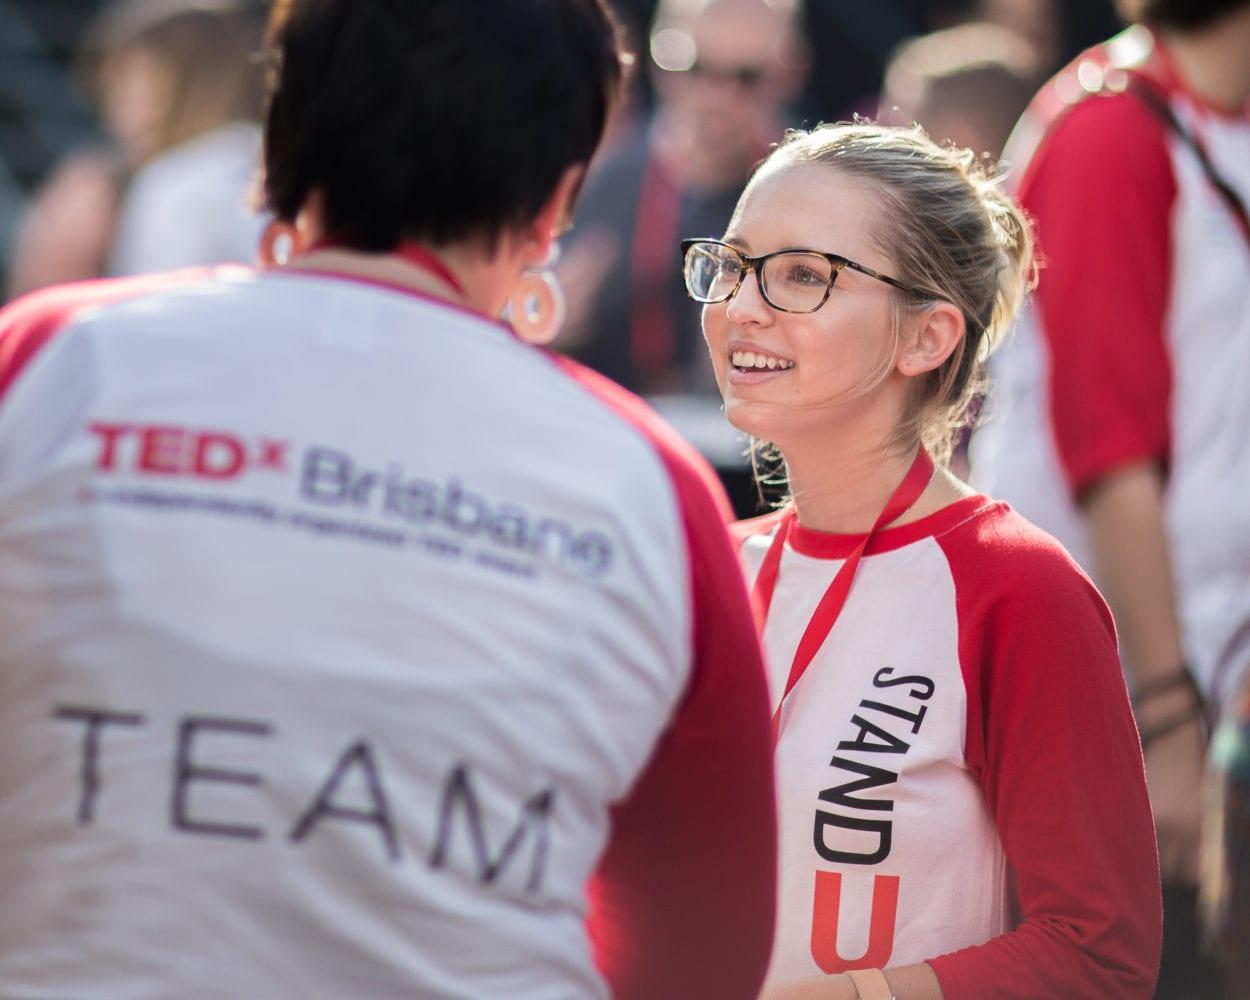 Emily Warner TEDxBrisbane Advocate